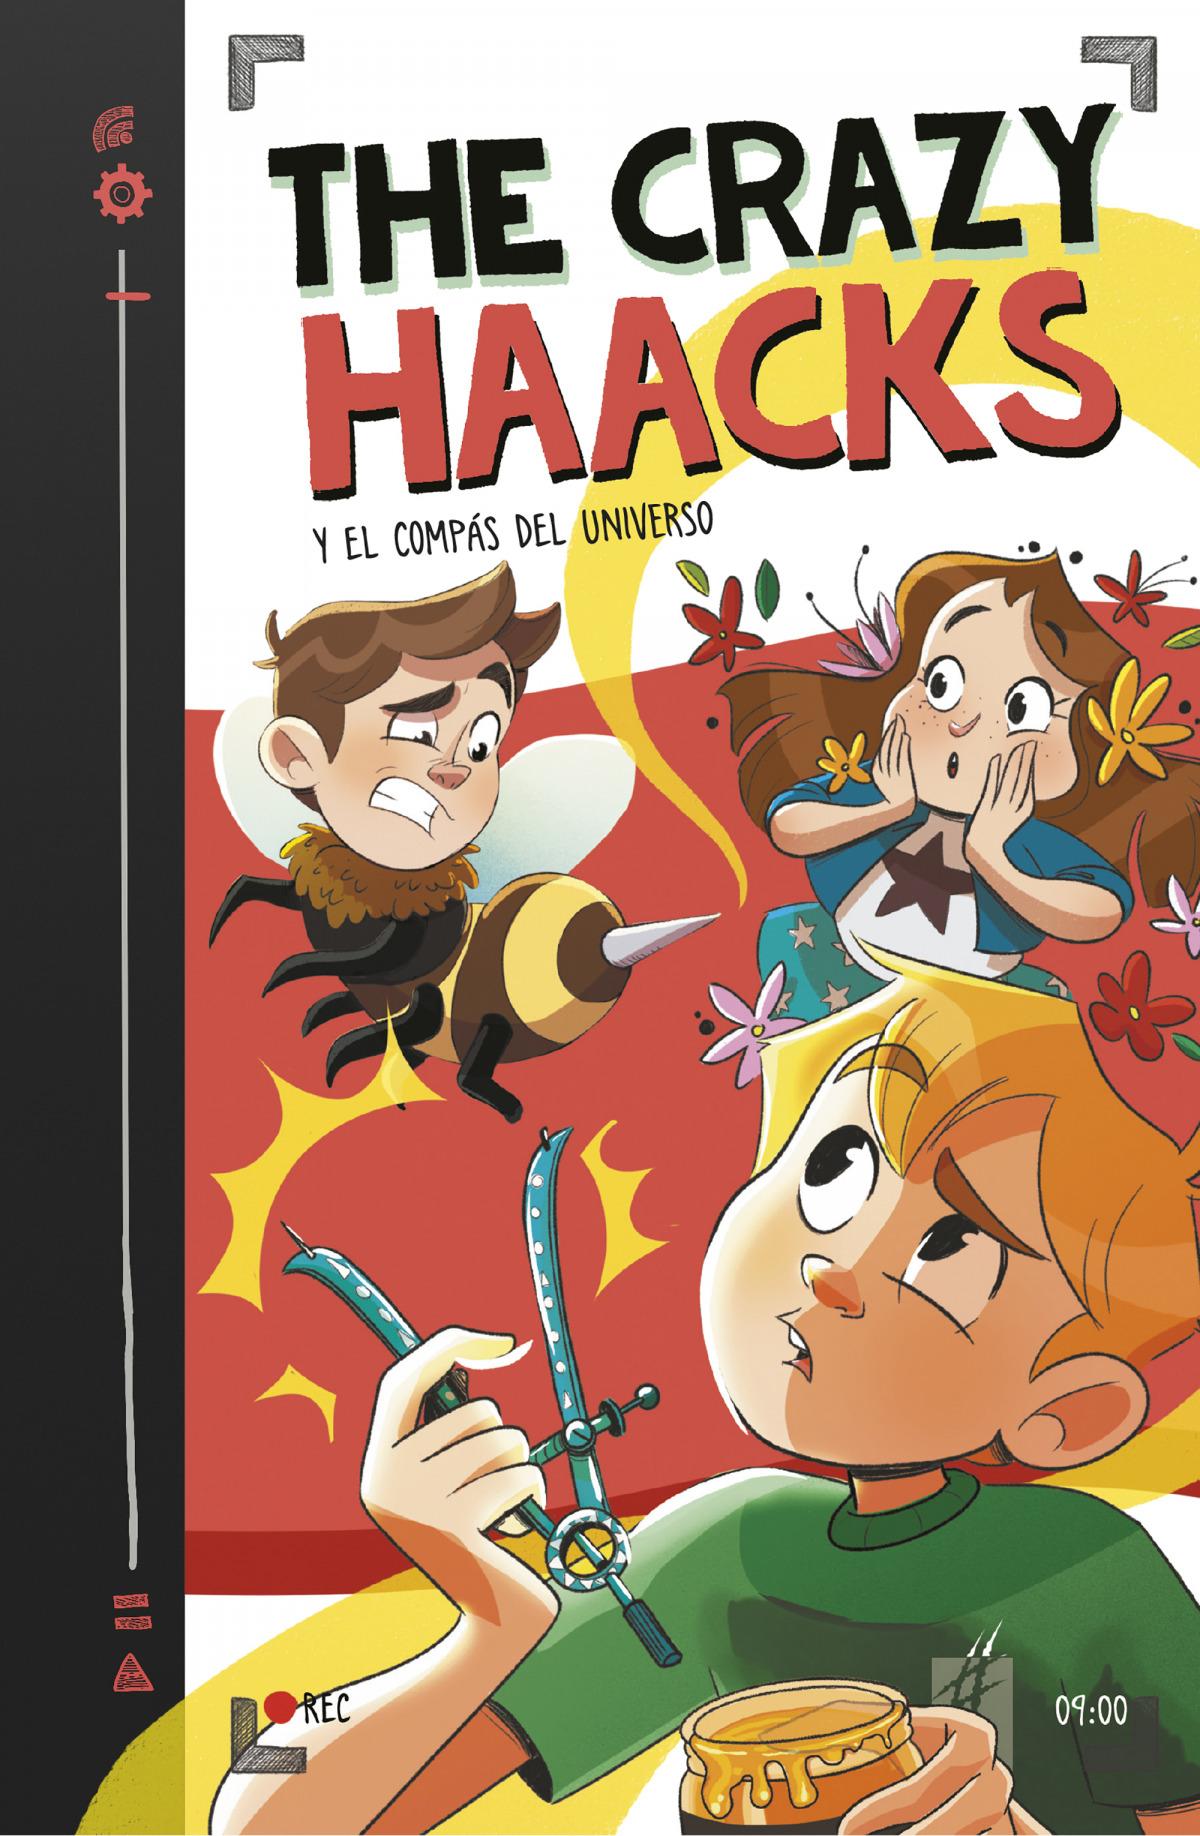 The Crazy Haacks y el compás del universo (Serie The Crazy Haacks 10) 9788418318504